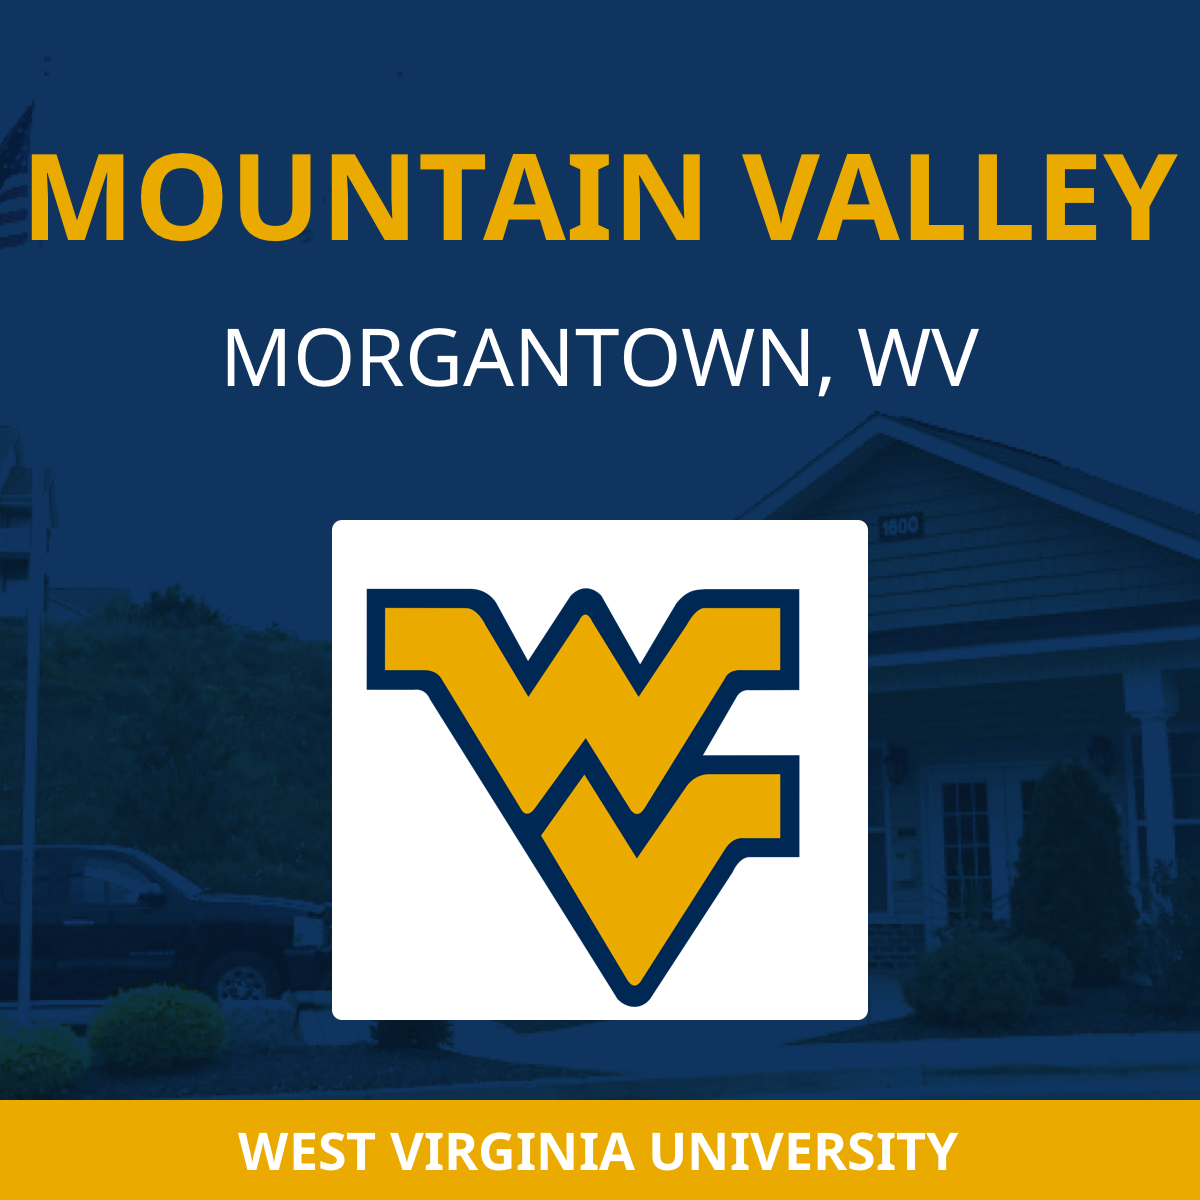 Wvu Student Housing Apartments Morgantown Morgantown Wv Cyber Cafe